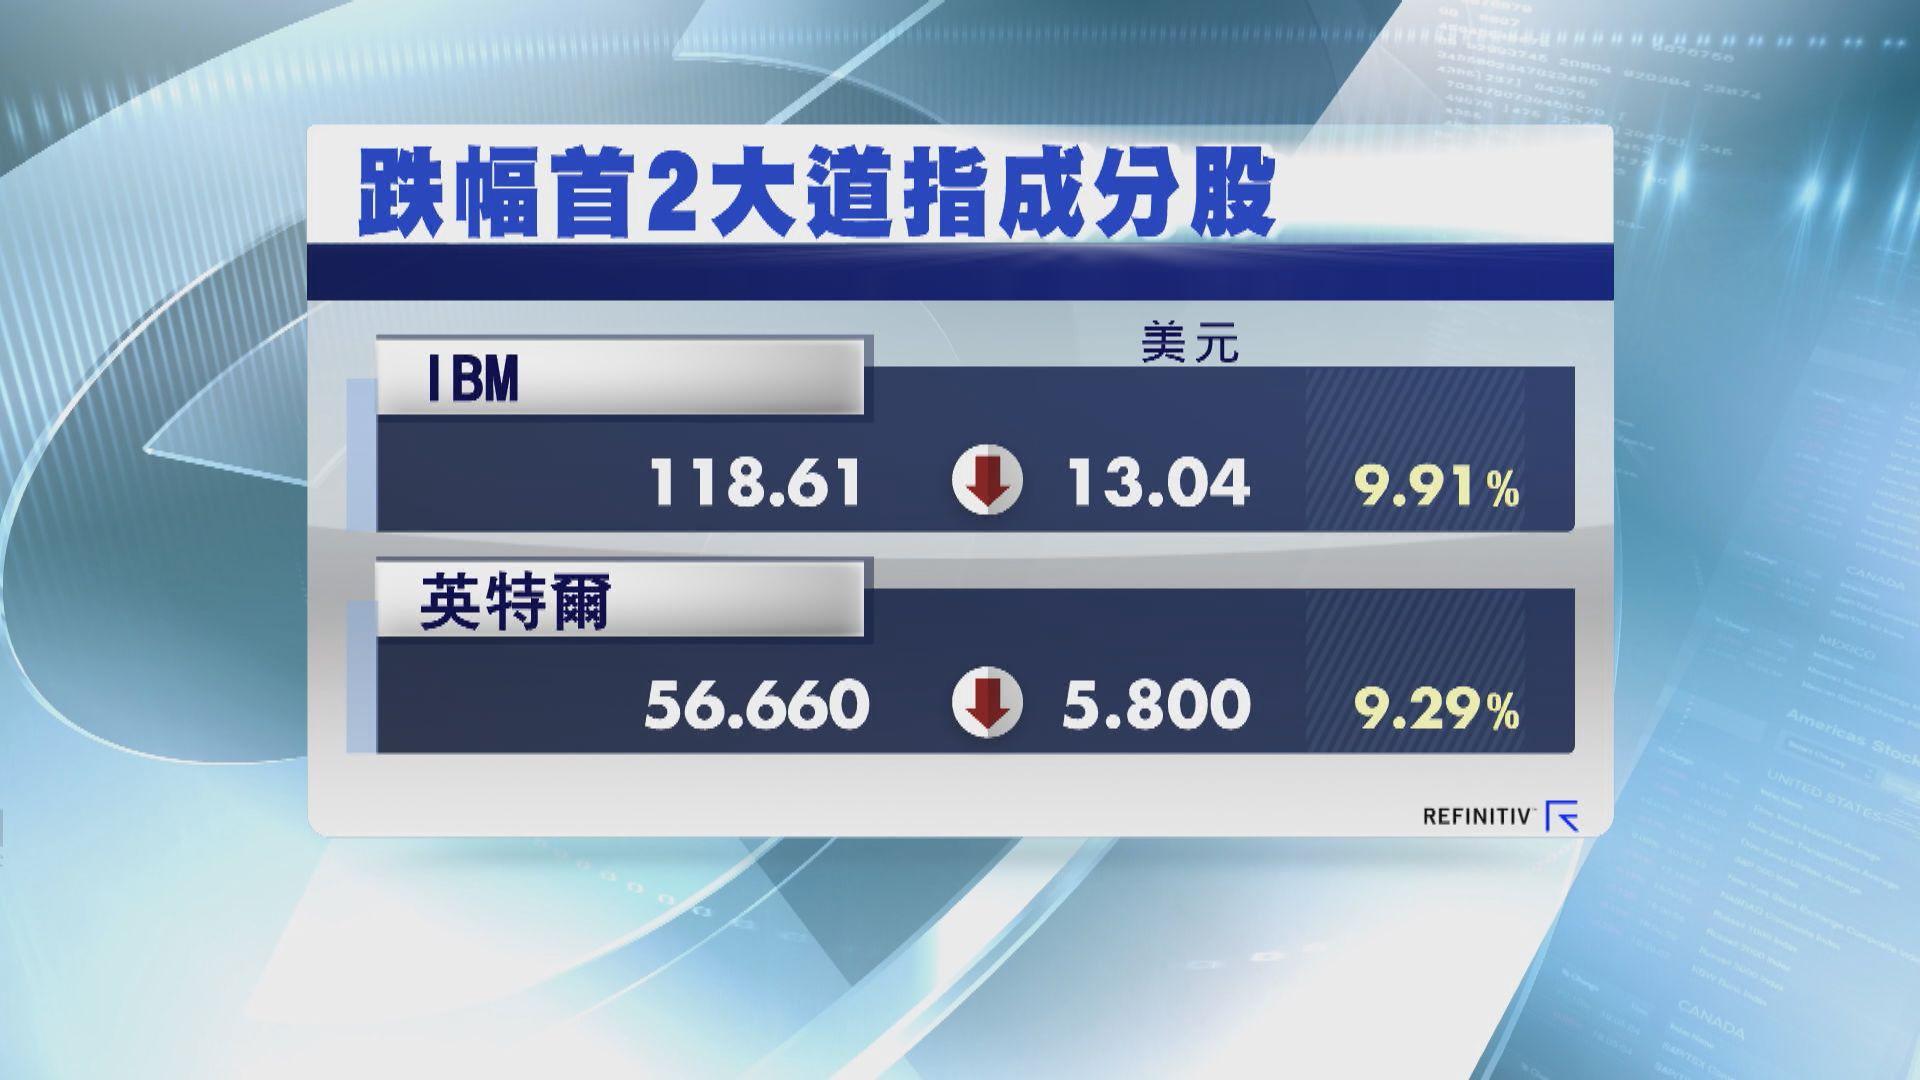 IBM及英特爾股價挫累道指2連跌 納指則再破頂